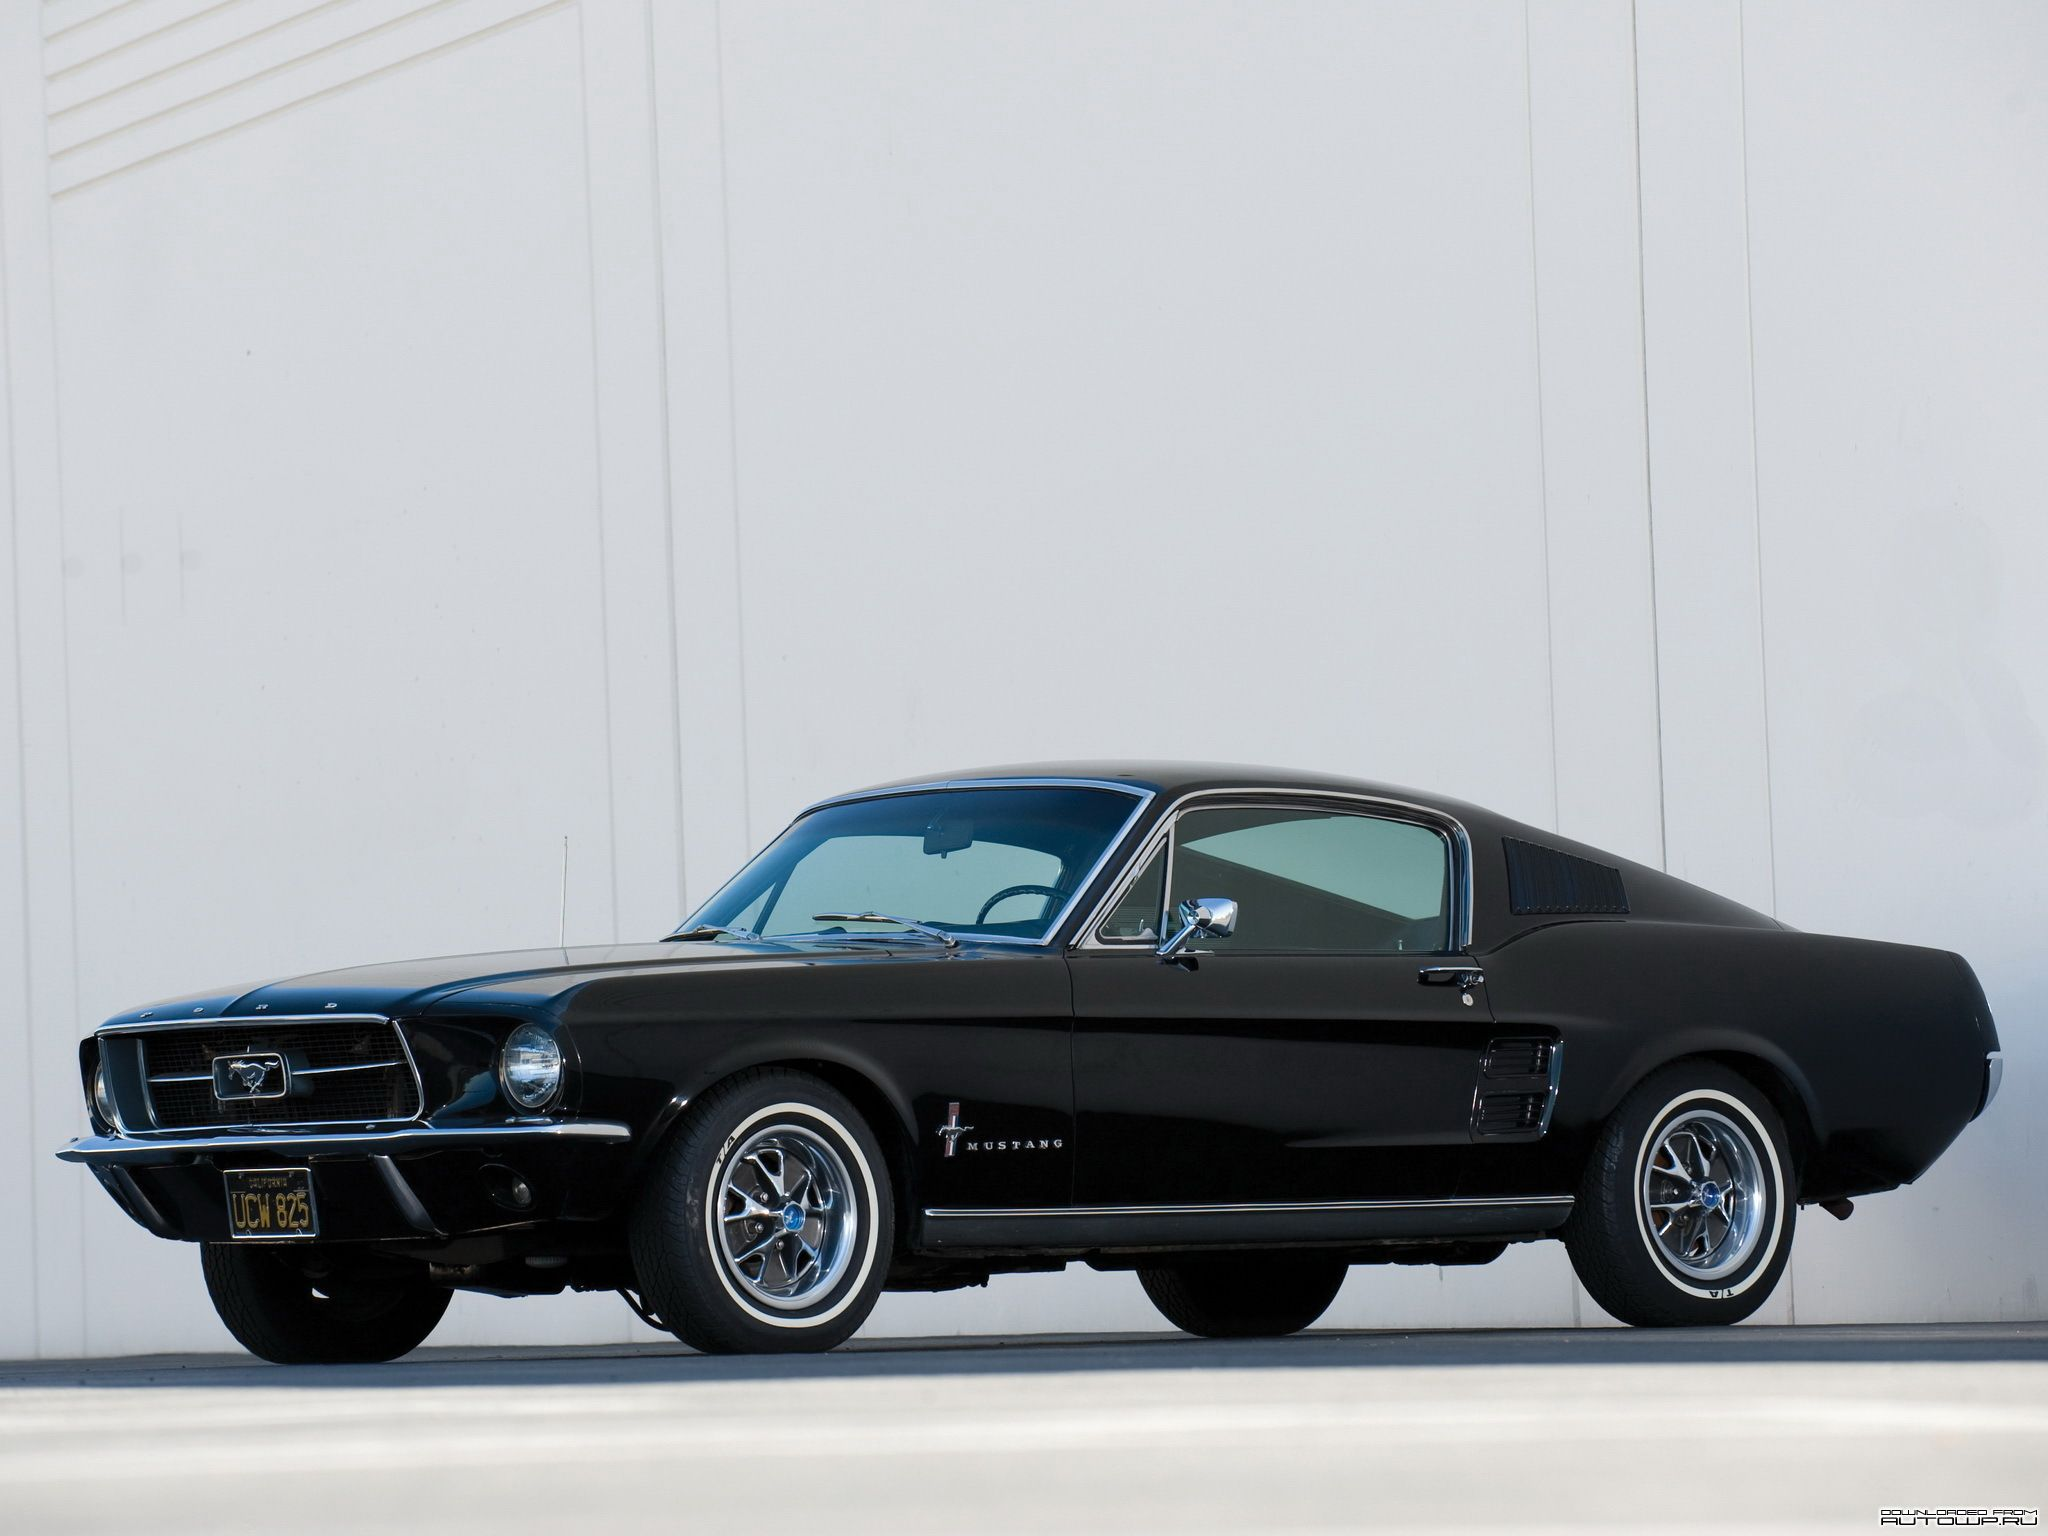 Mustang Fastback '1967 Mustang fastback, Ford mustang